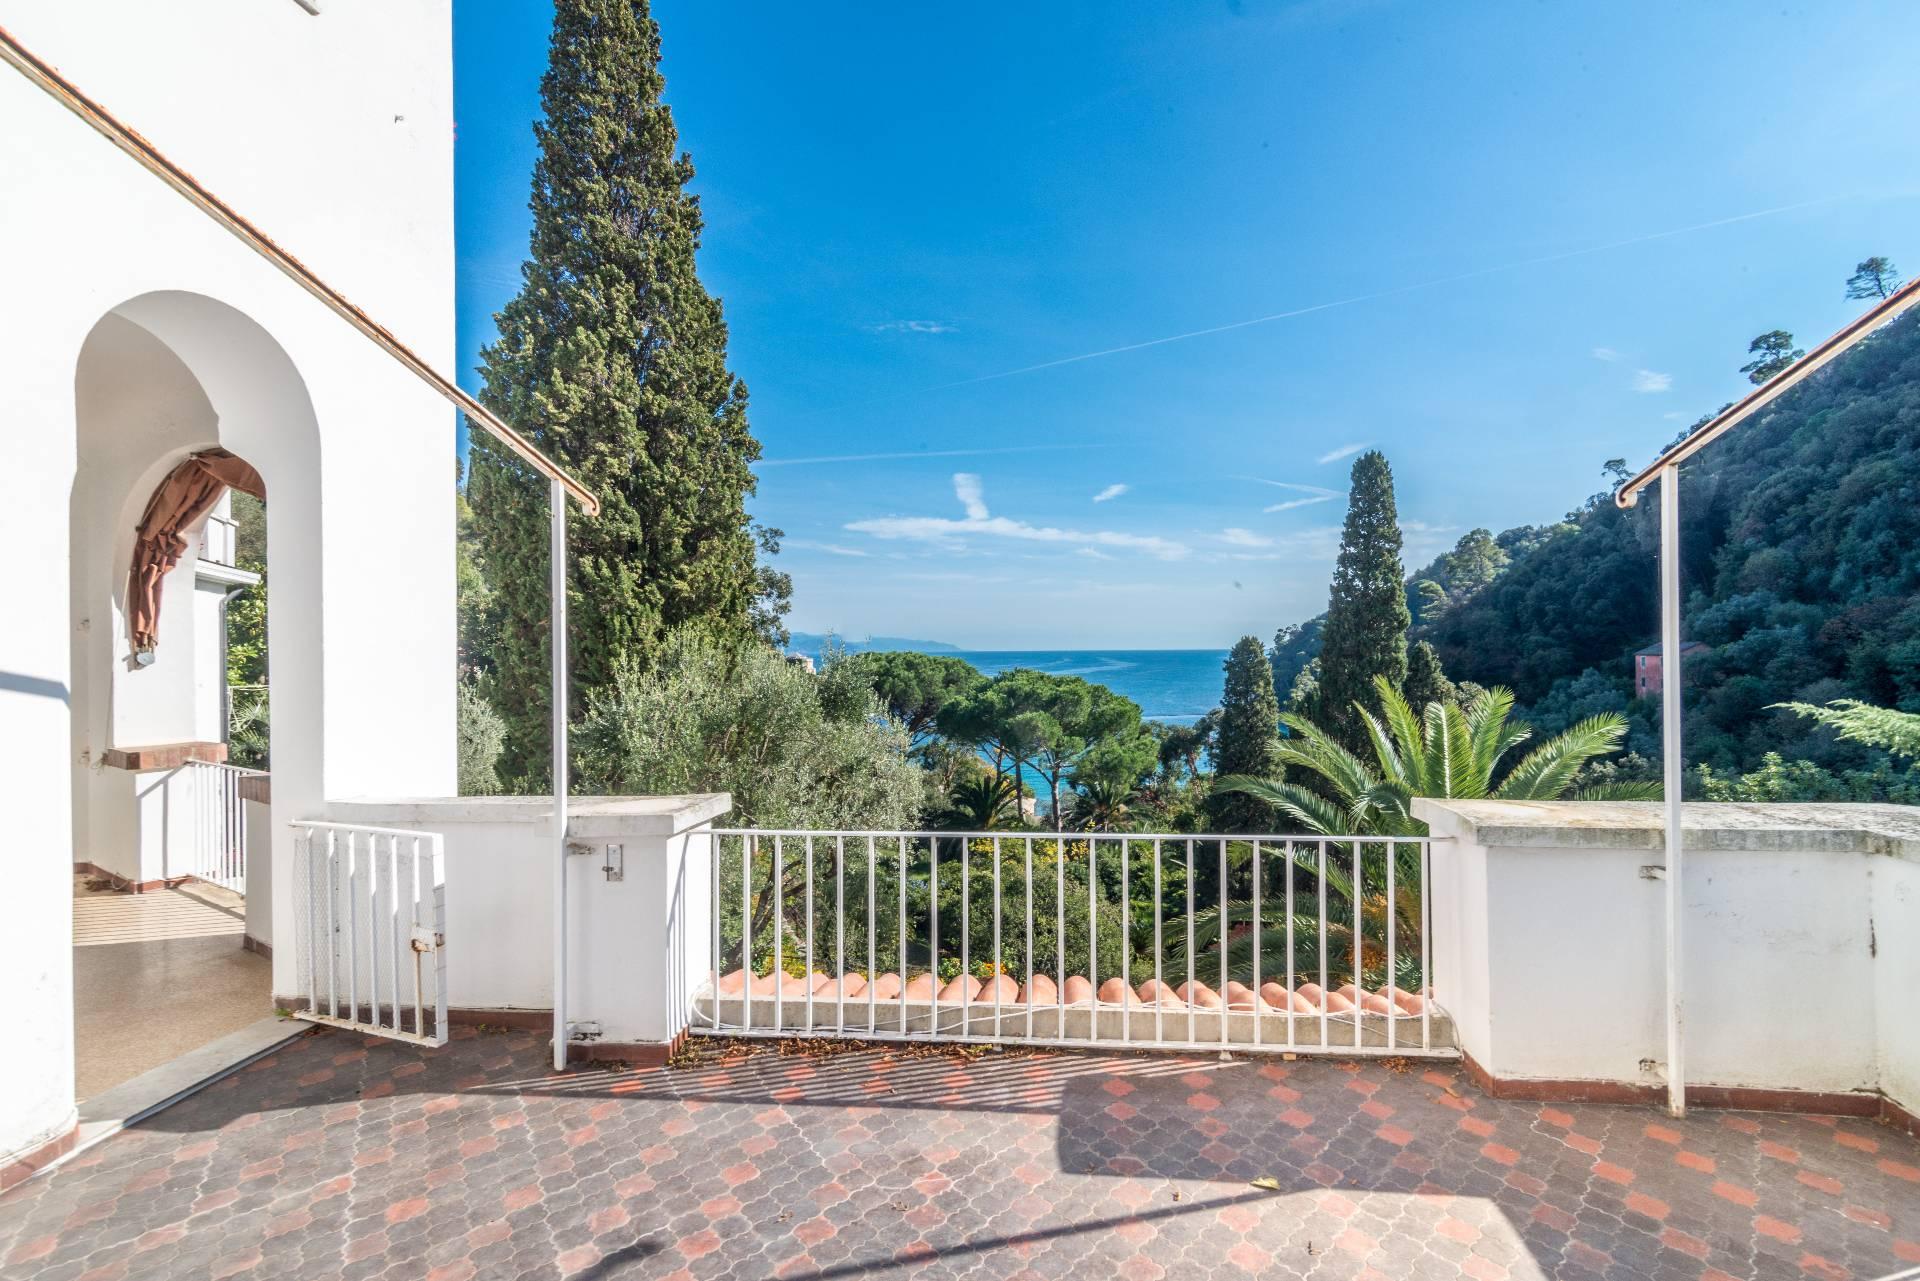 Appartamento in Vendita a Santa Margherita Ligure via gave